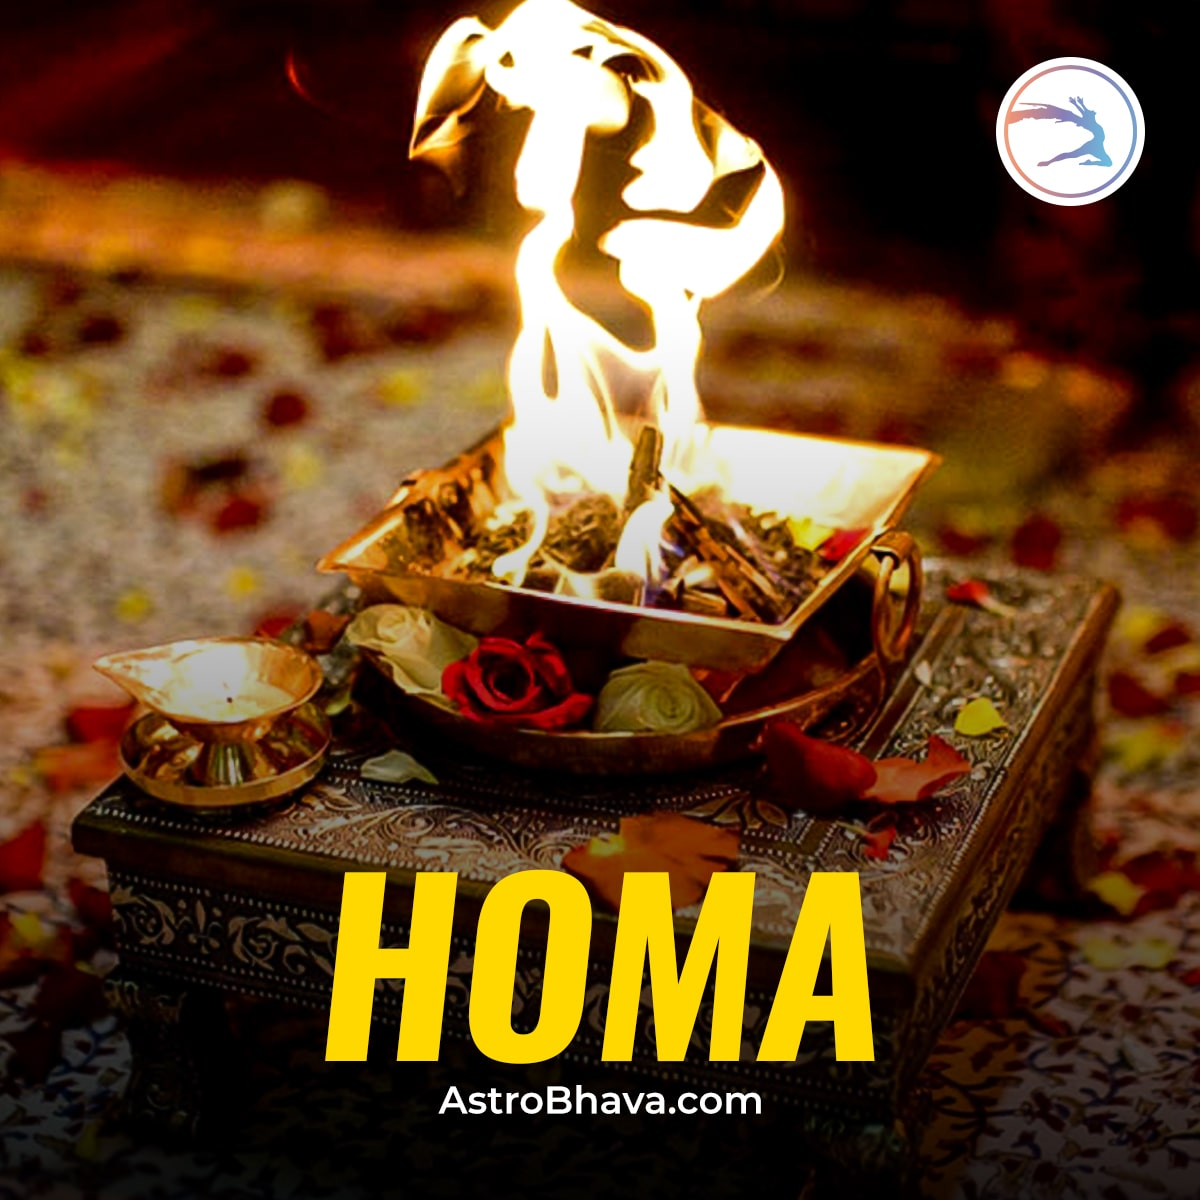 Book Online Homa Services with AstroBhava.com